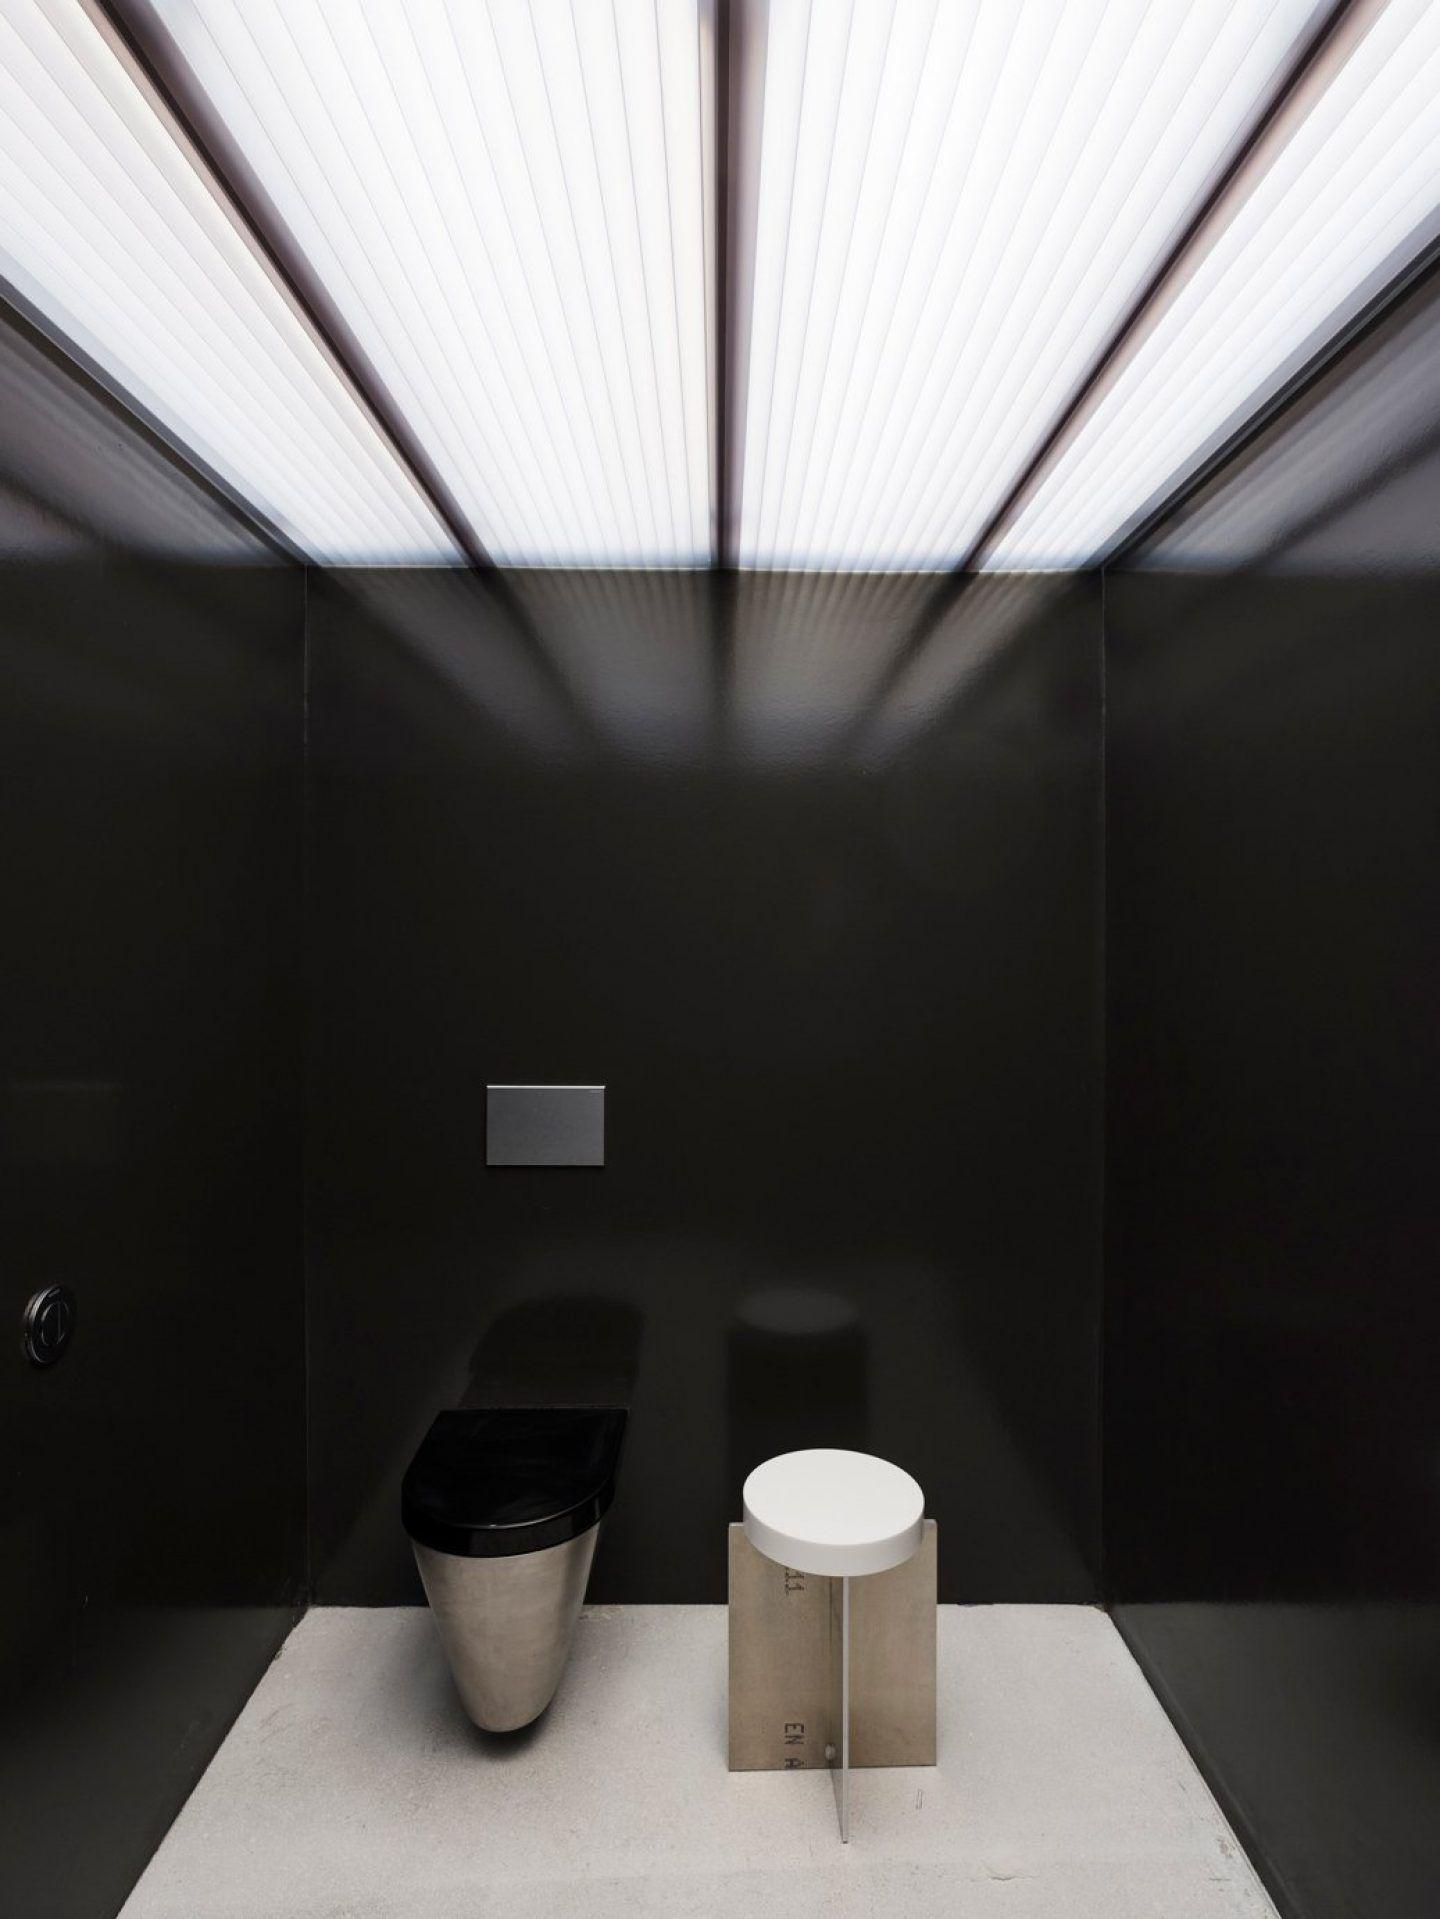 IGNANT-Architecture-Gonzalez-Haas-Tem-Plate-025